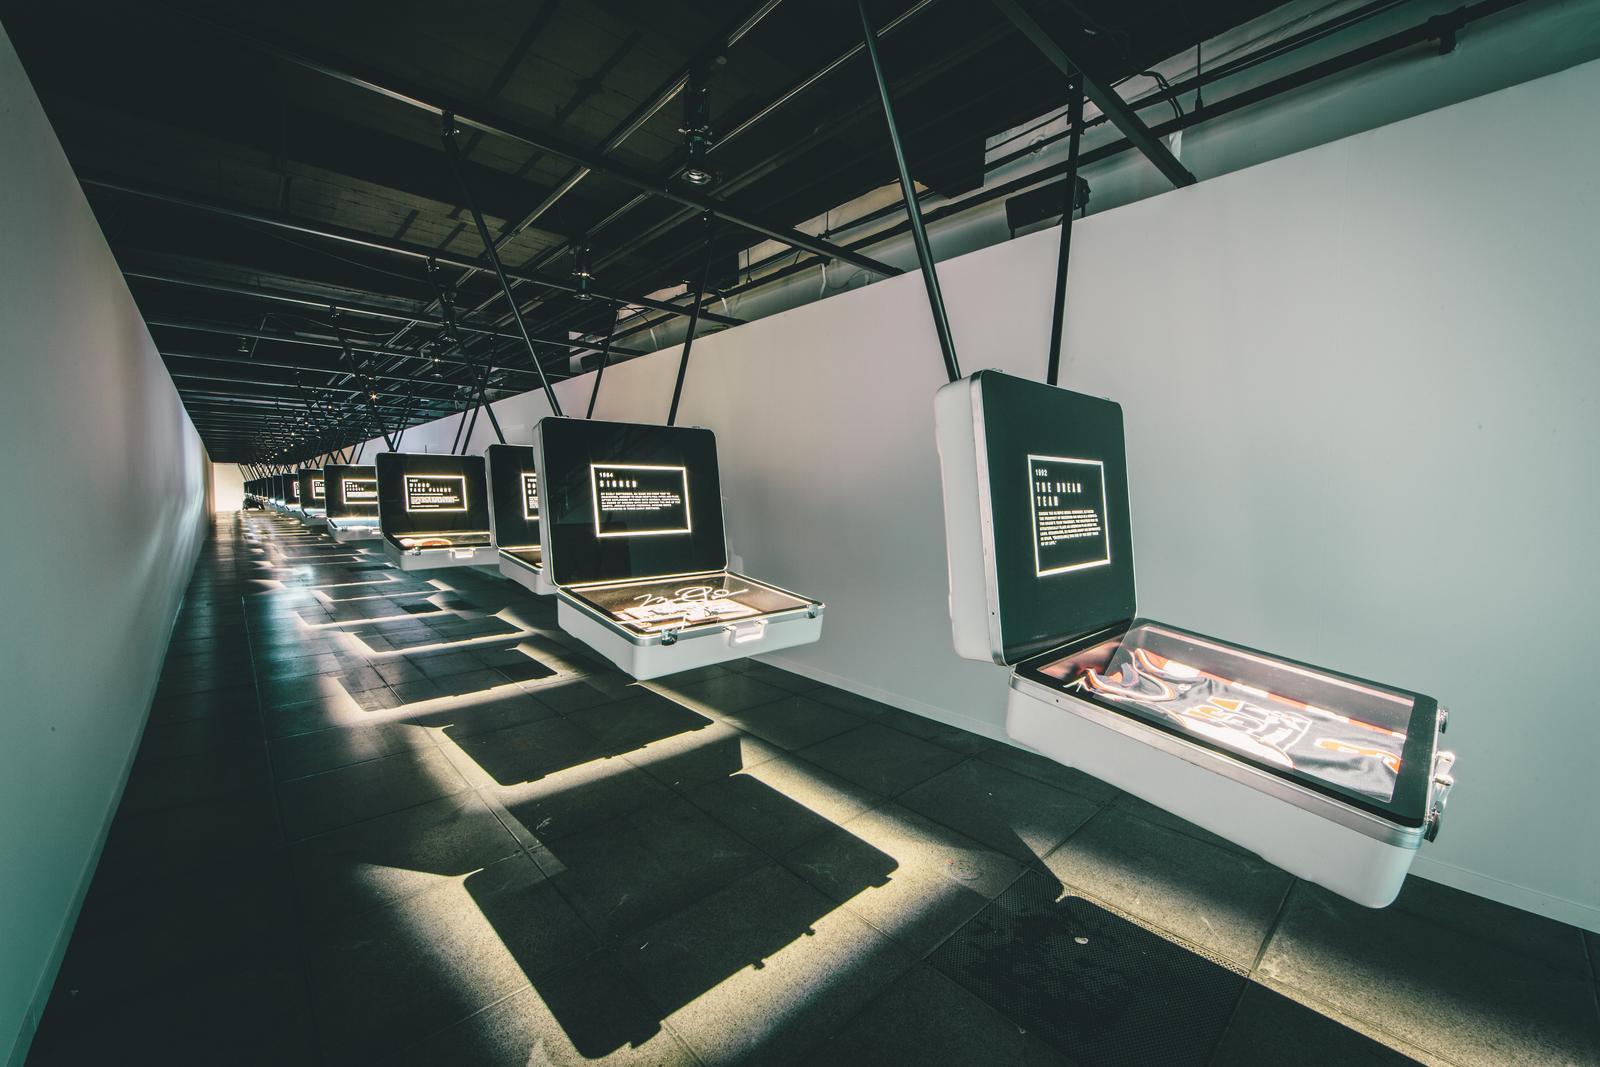 Jordan Brand's Pearl Pavilion: Hallway of Greatness